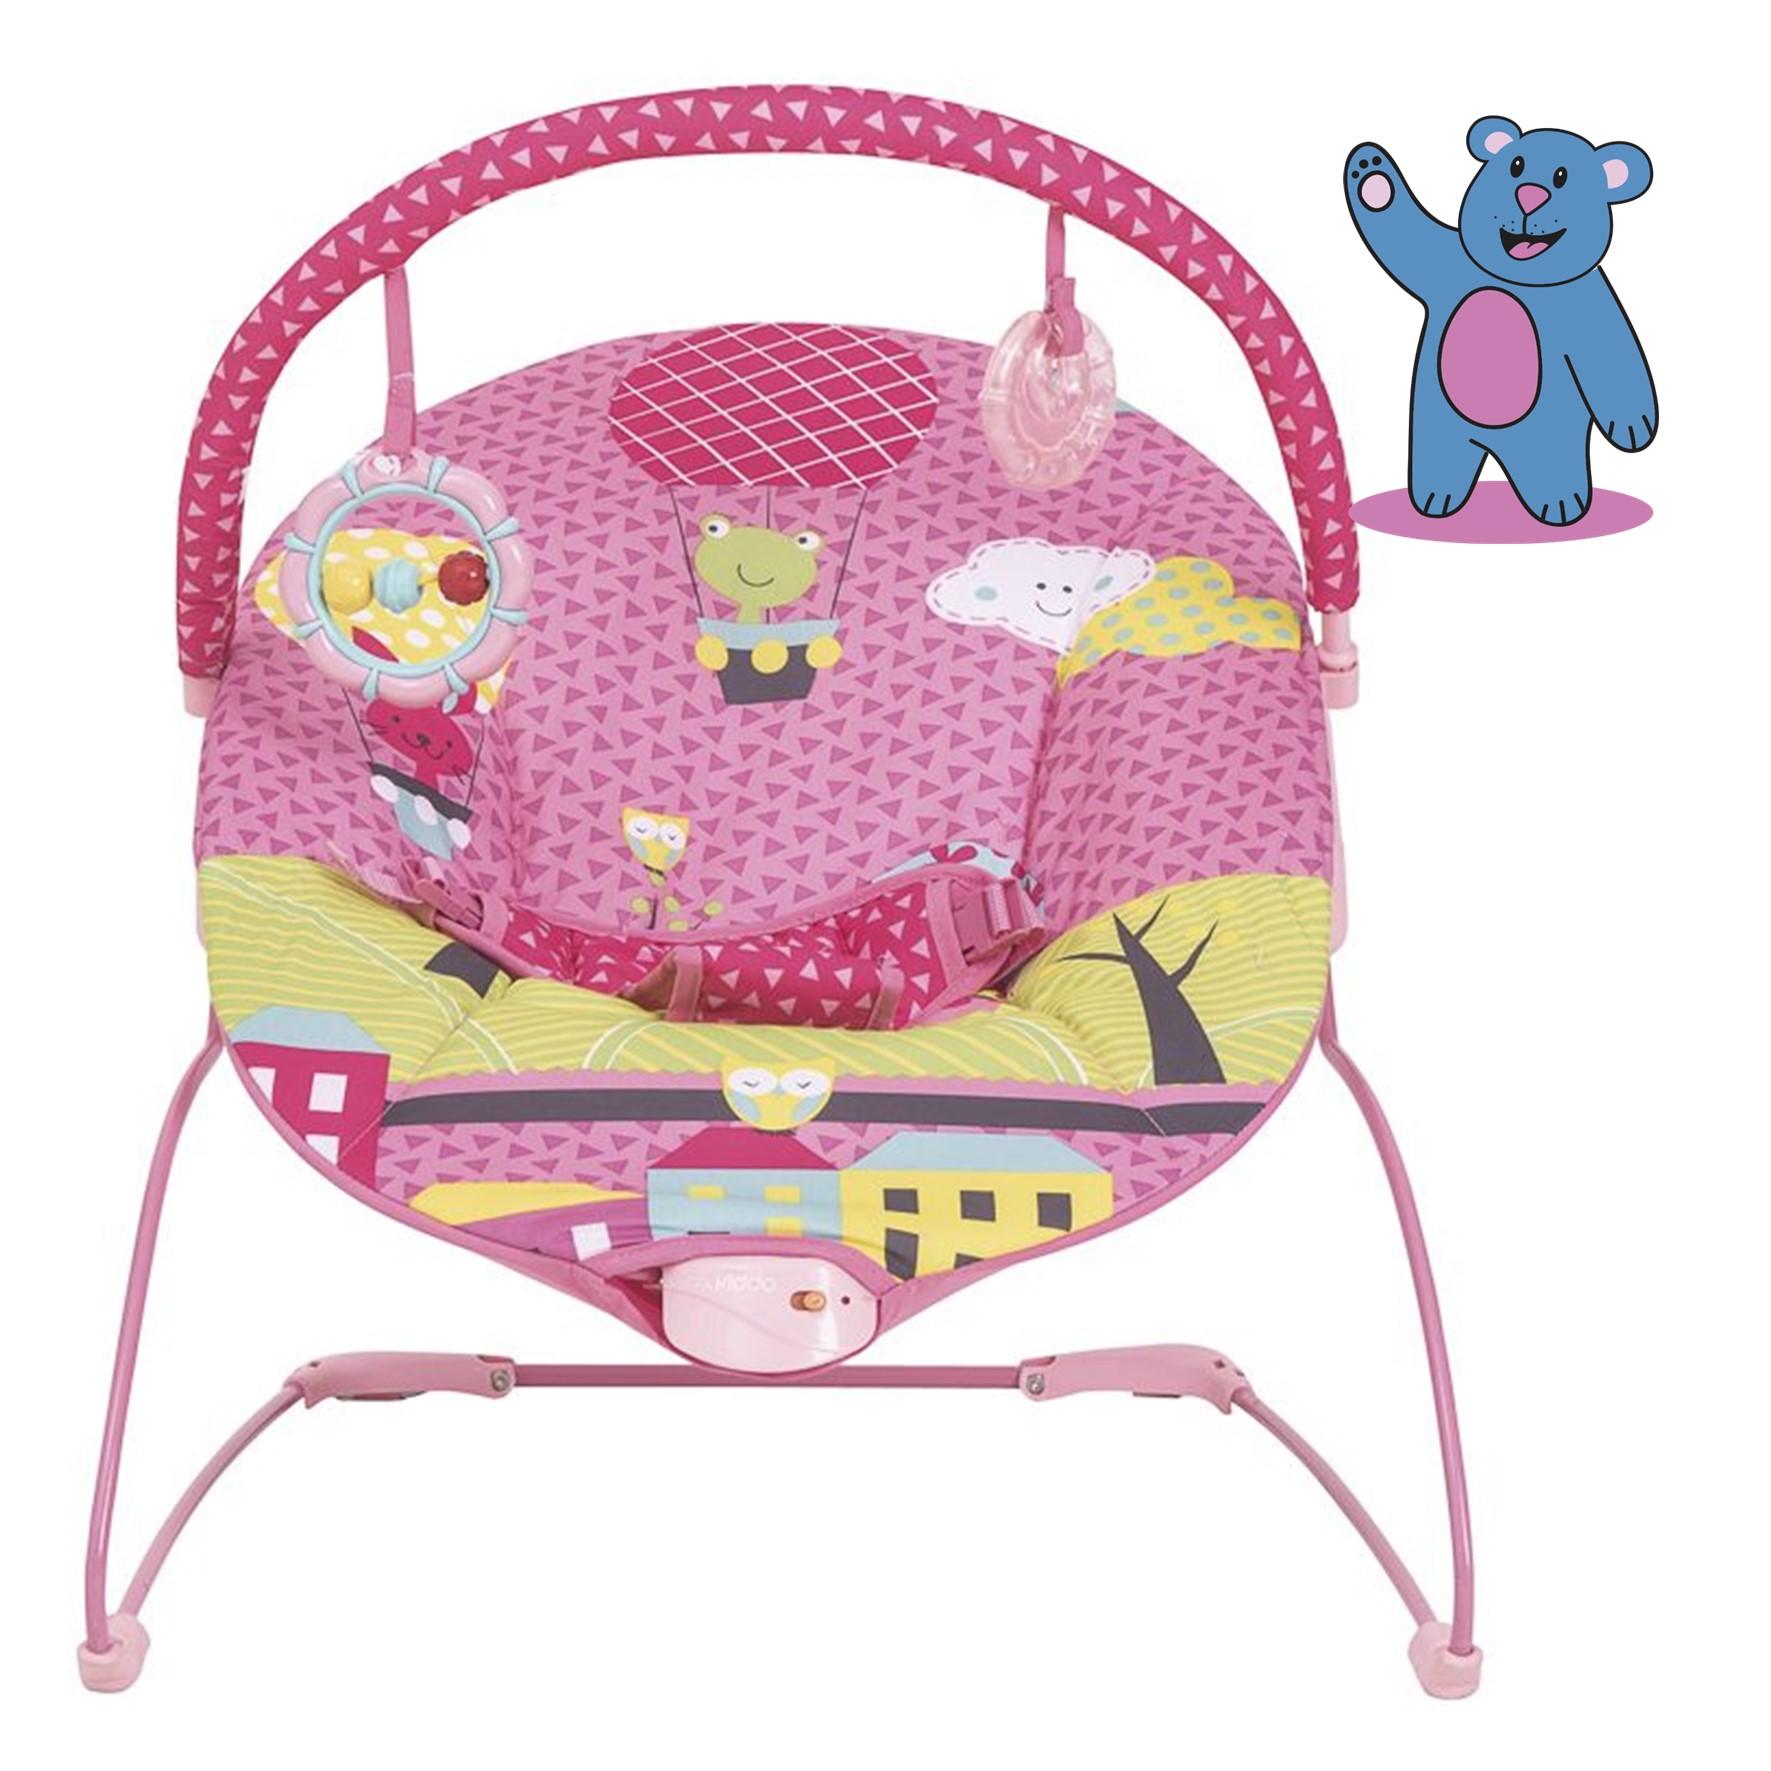 Cadeira de Descanso - Joy - Kiddo-Até 9 Kg - Rosa